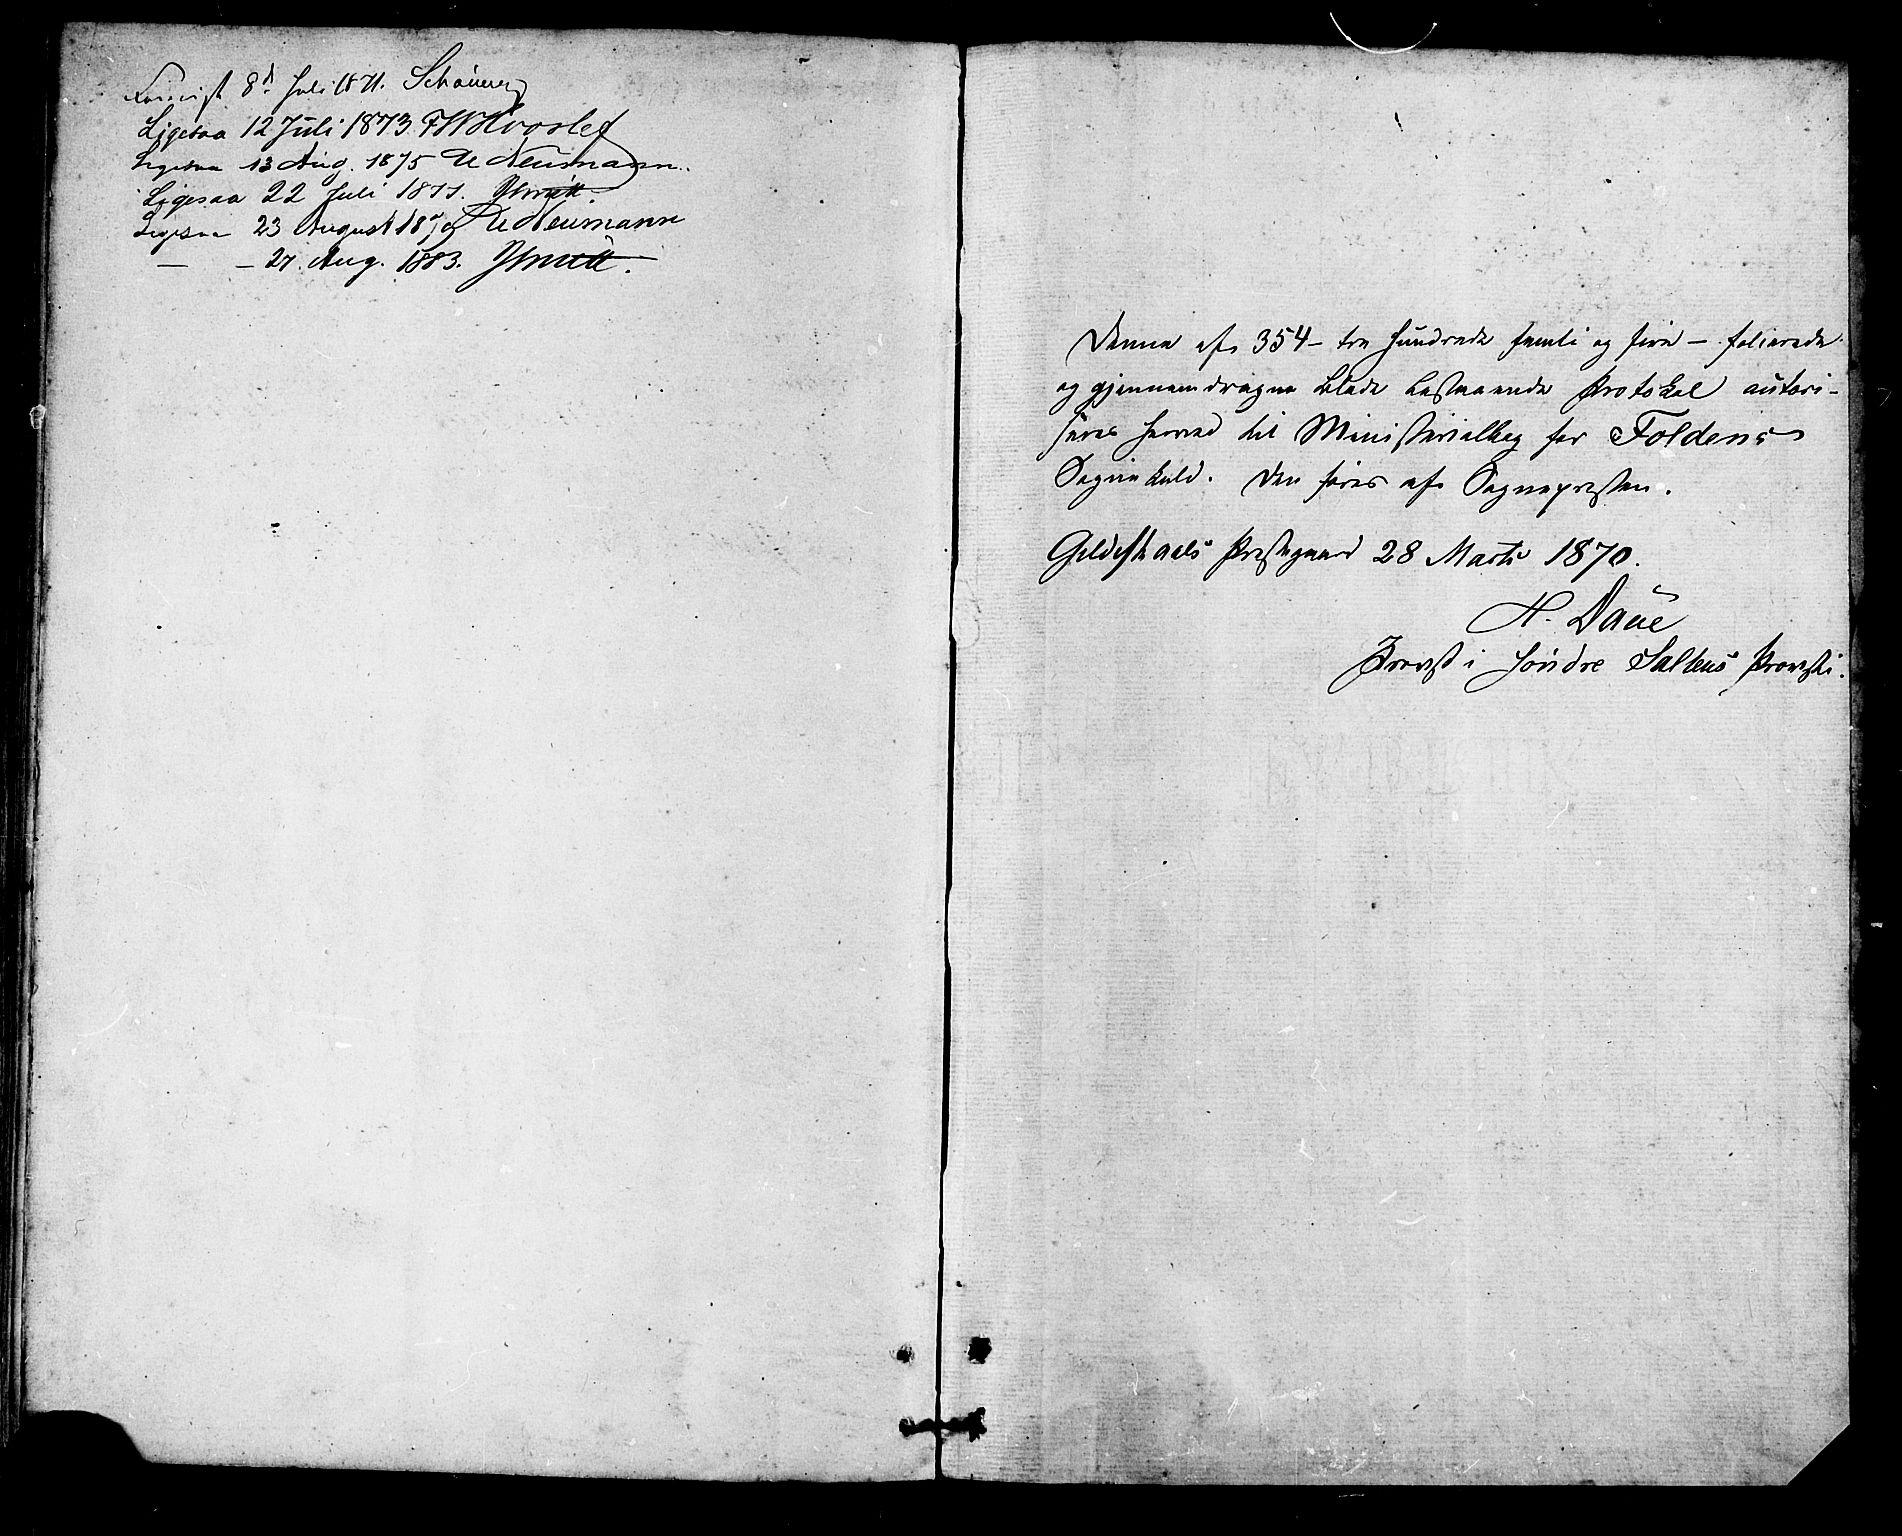 SAT, Ministerialprotokoller, klokkerbøker og fødselsregistre - Nordland, 853/L0771: Ministerialbok nr. 853A10, 1870-1881